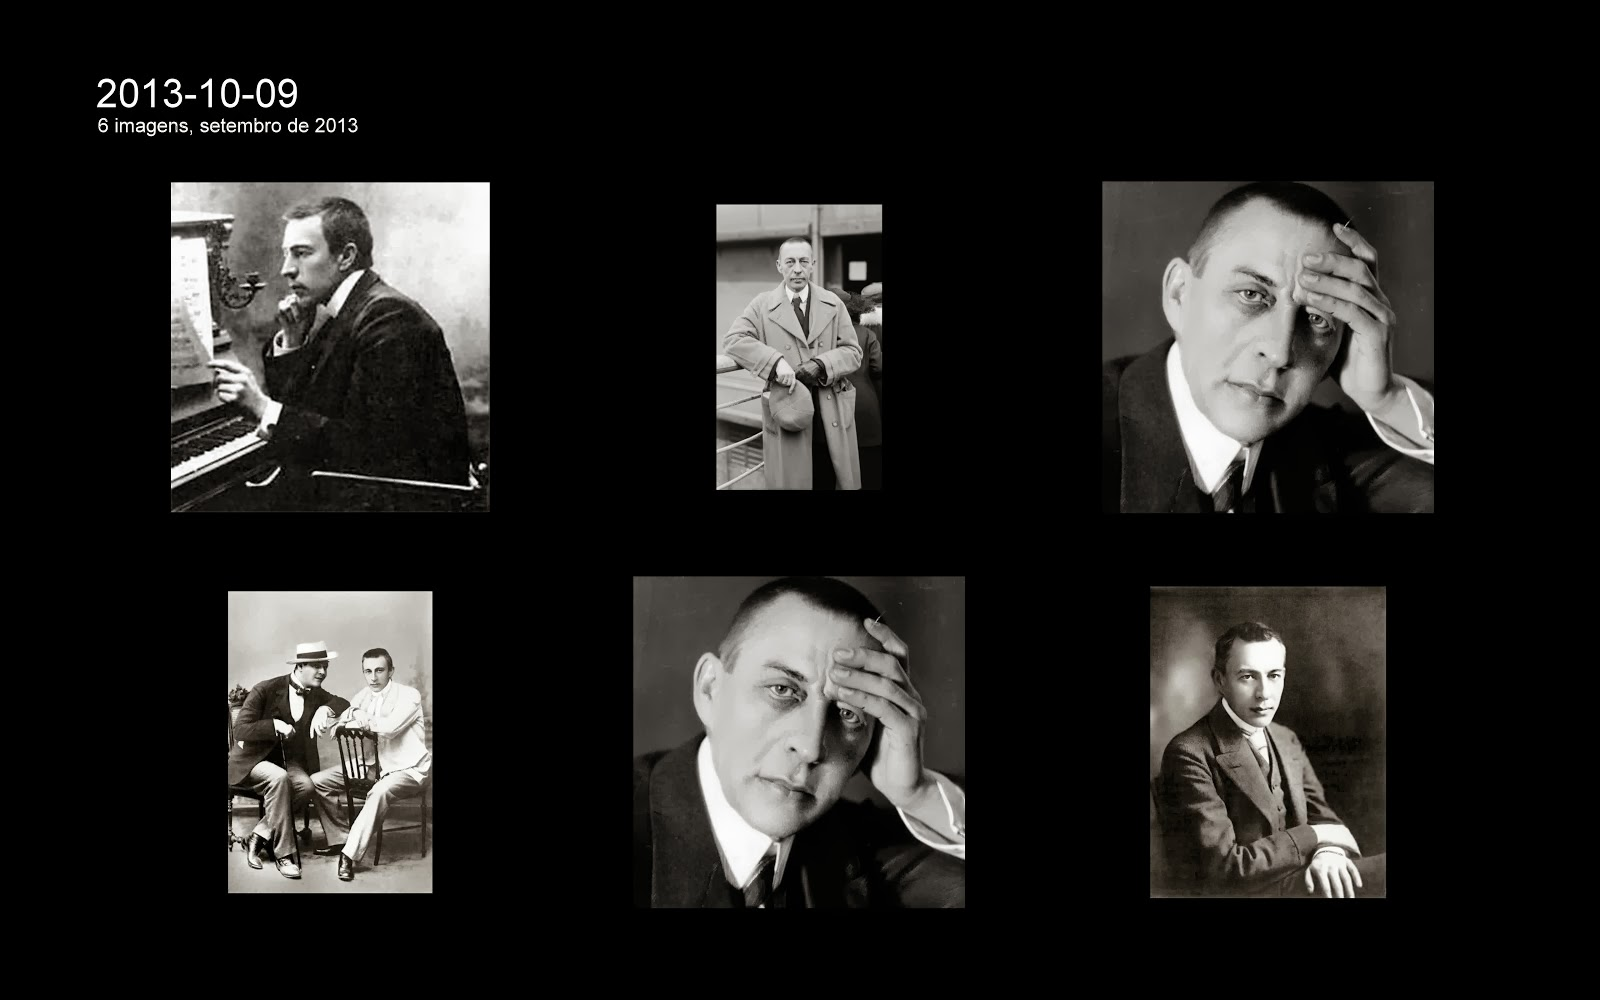 Sergey Rachmaninov (1873-1943).